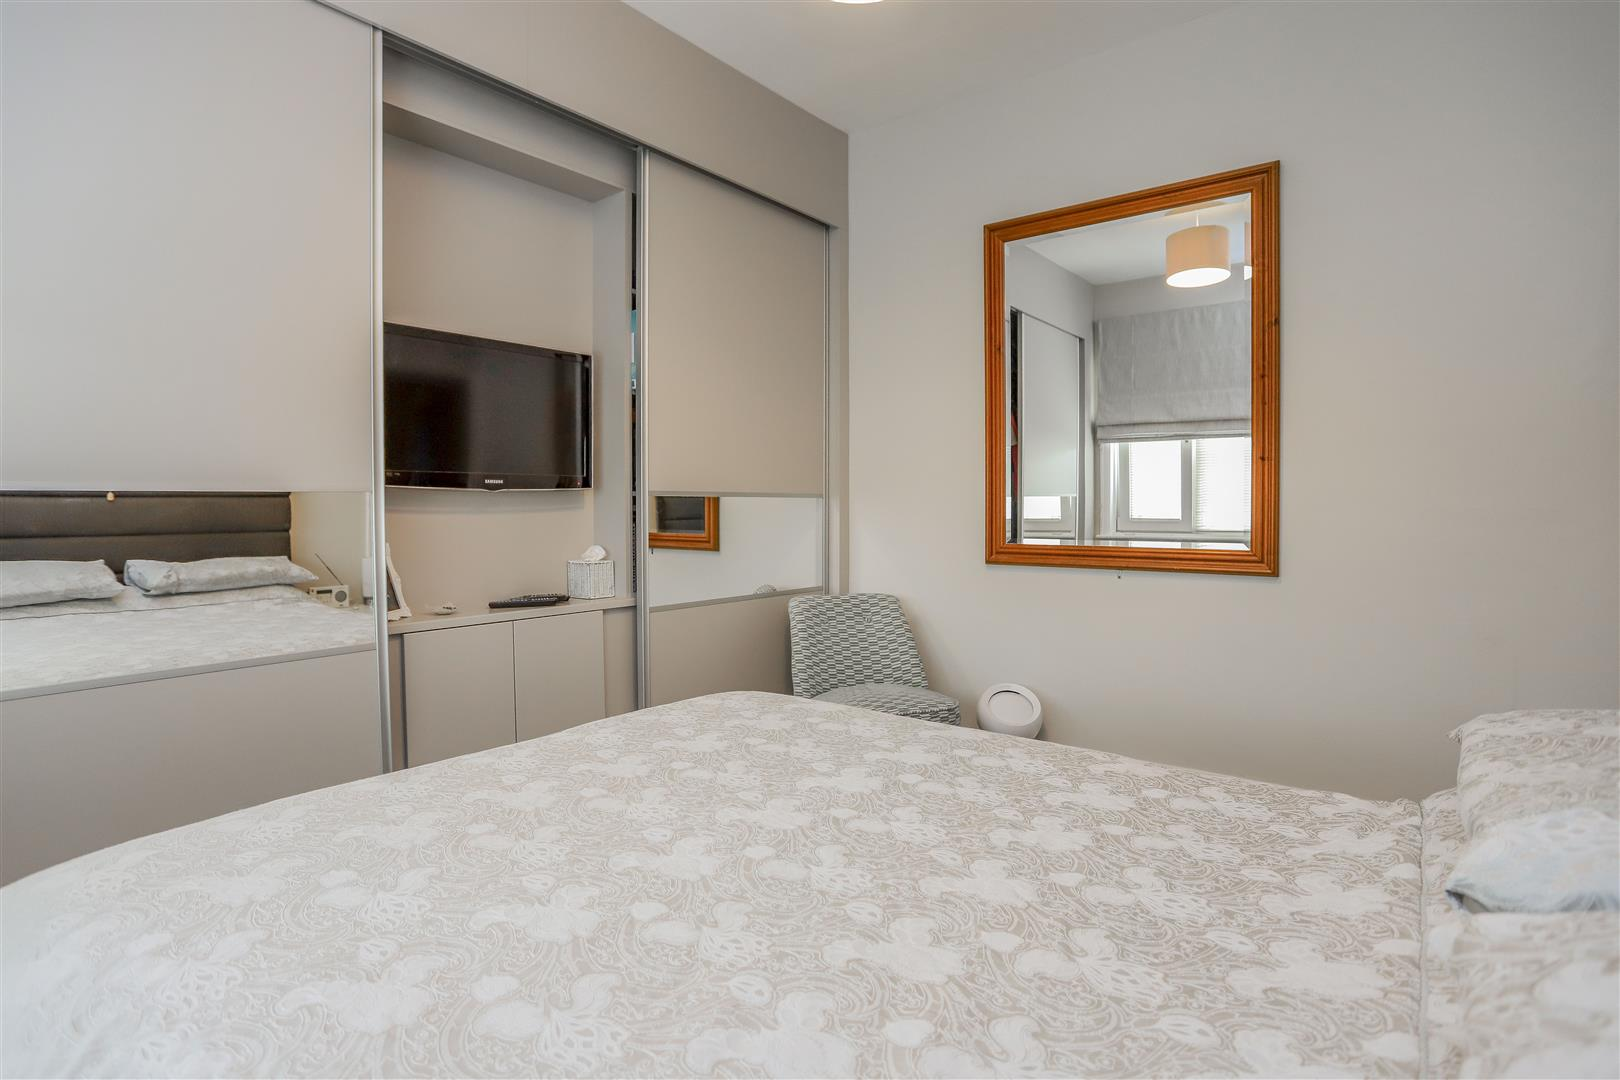 3 Bedroom Semi-detached House For Sale - 24.JPG